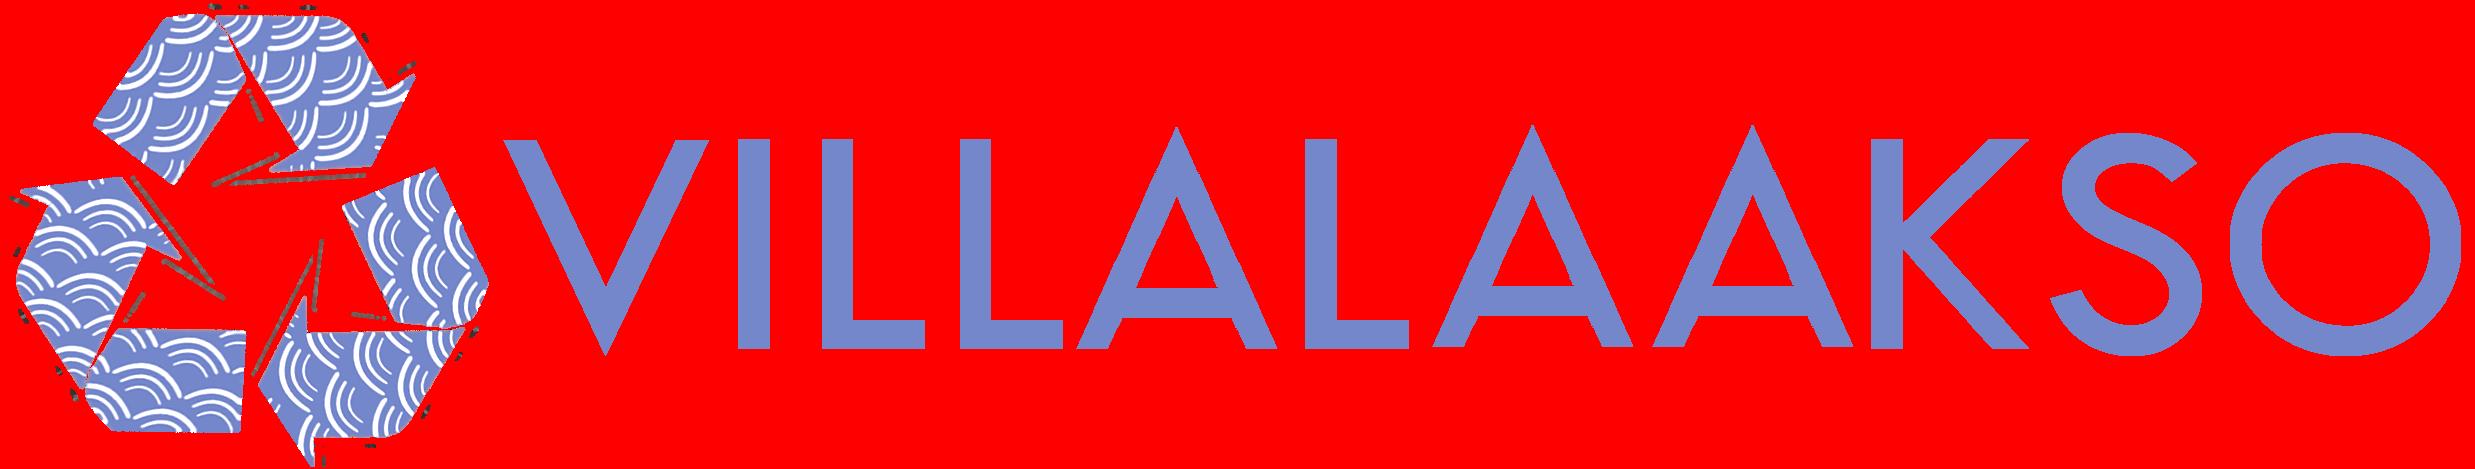 Kiertovilla Logo